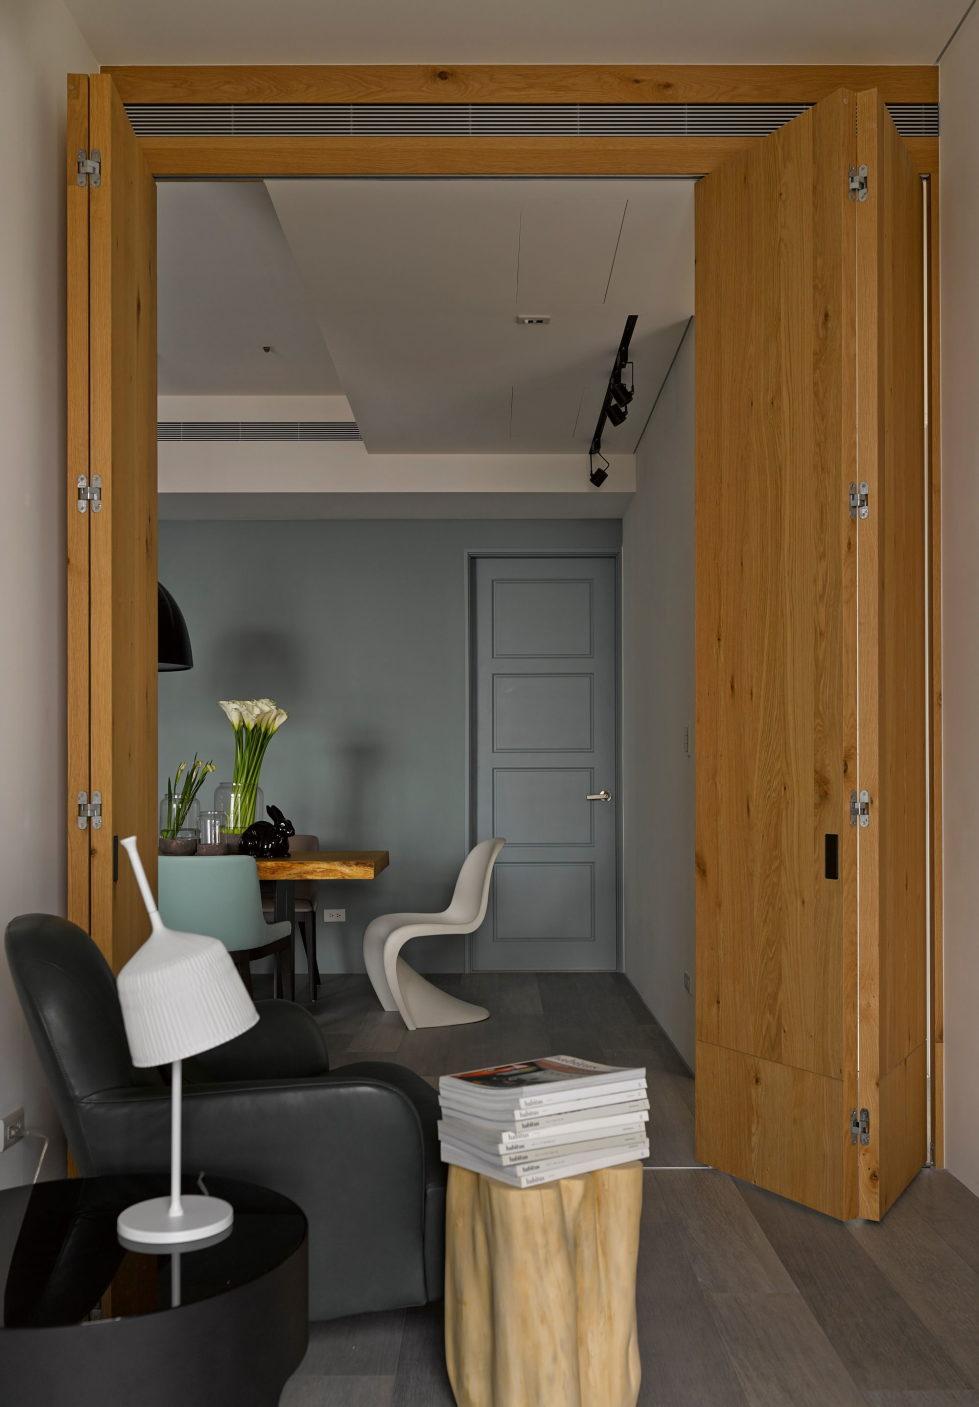 Modern Three-Room Apartment From Ganna Design Studio In Taipei, Taiwan 11